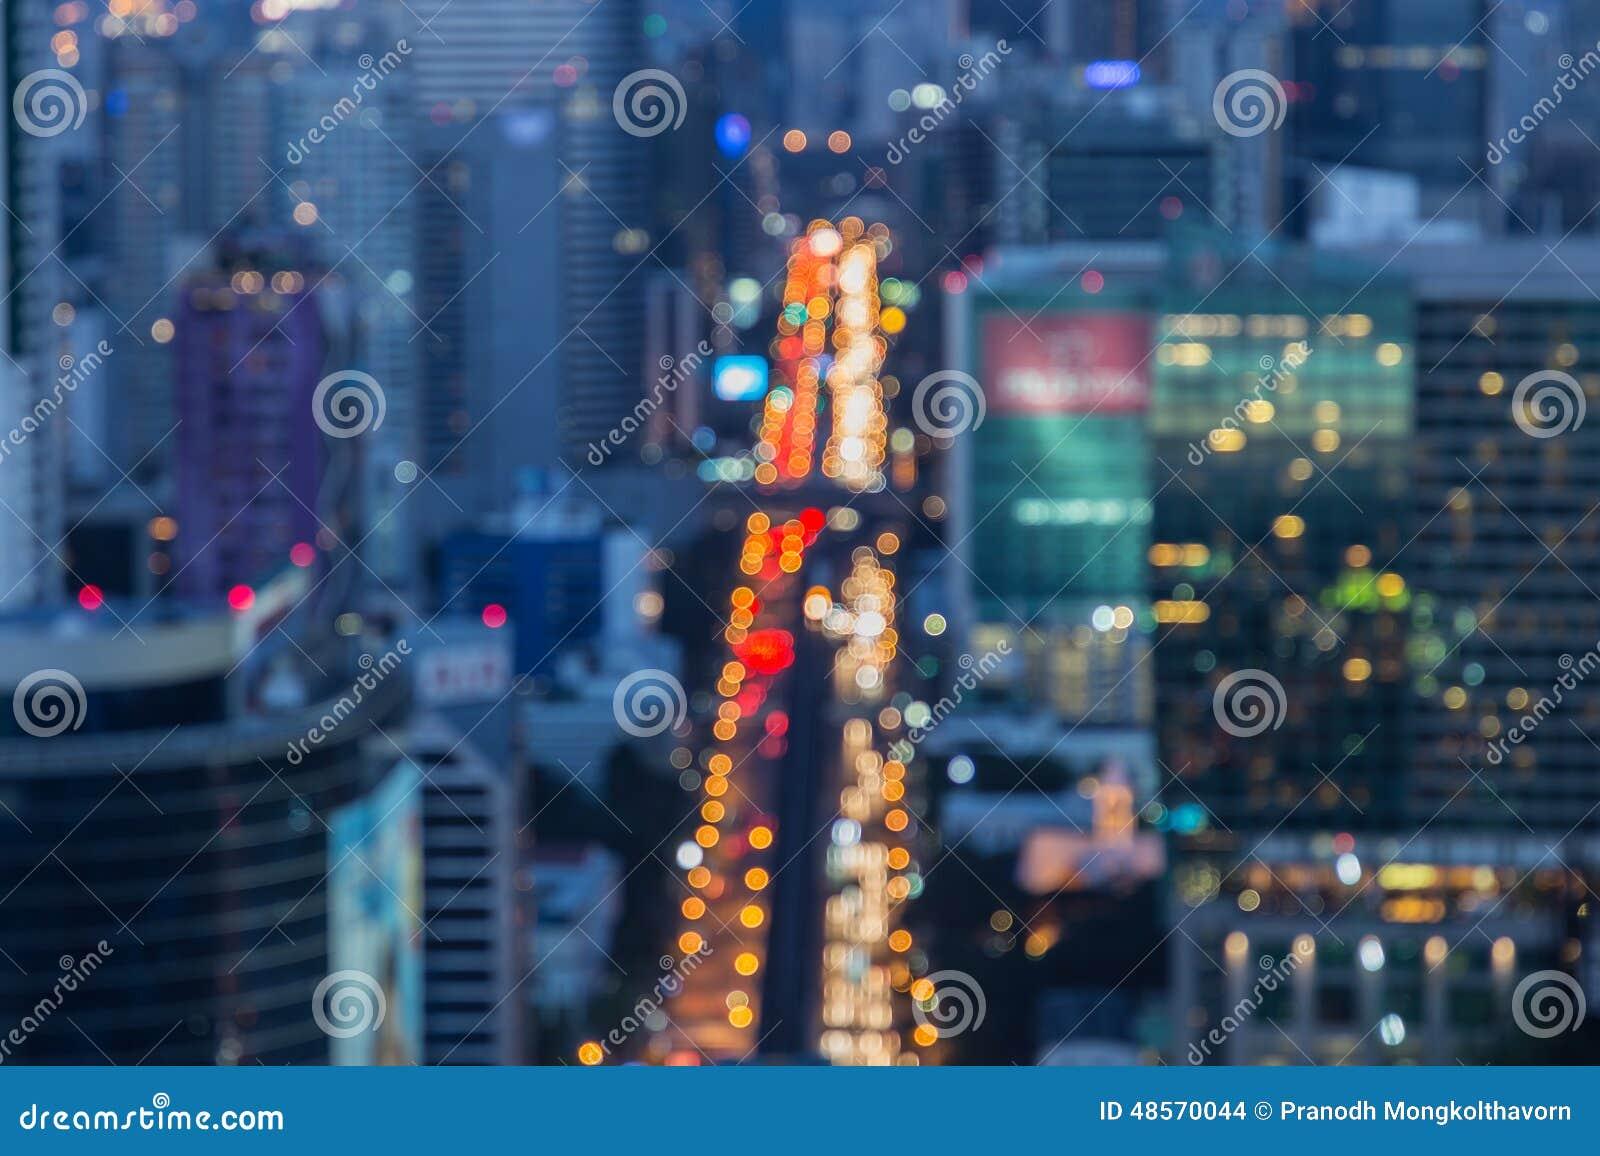 Blurred Defocused Big City Lights of Heavy Traffic at Night